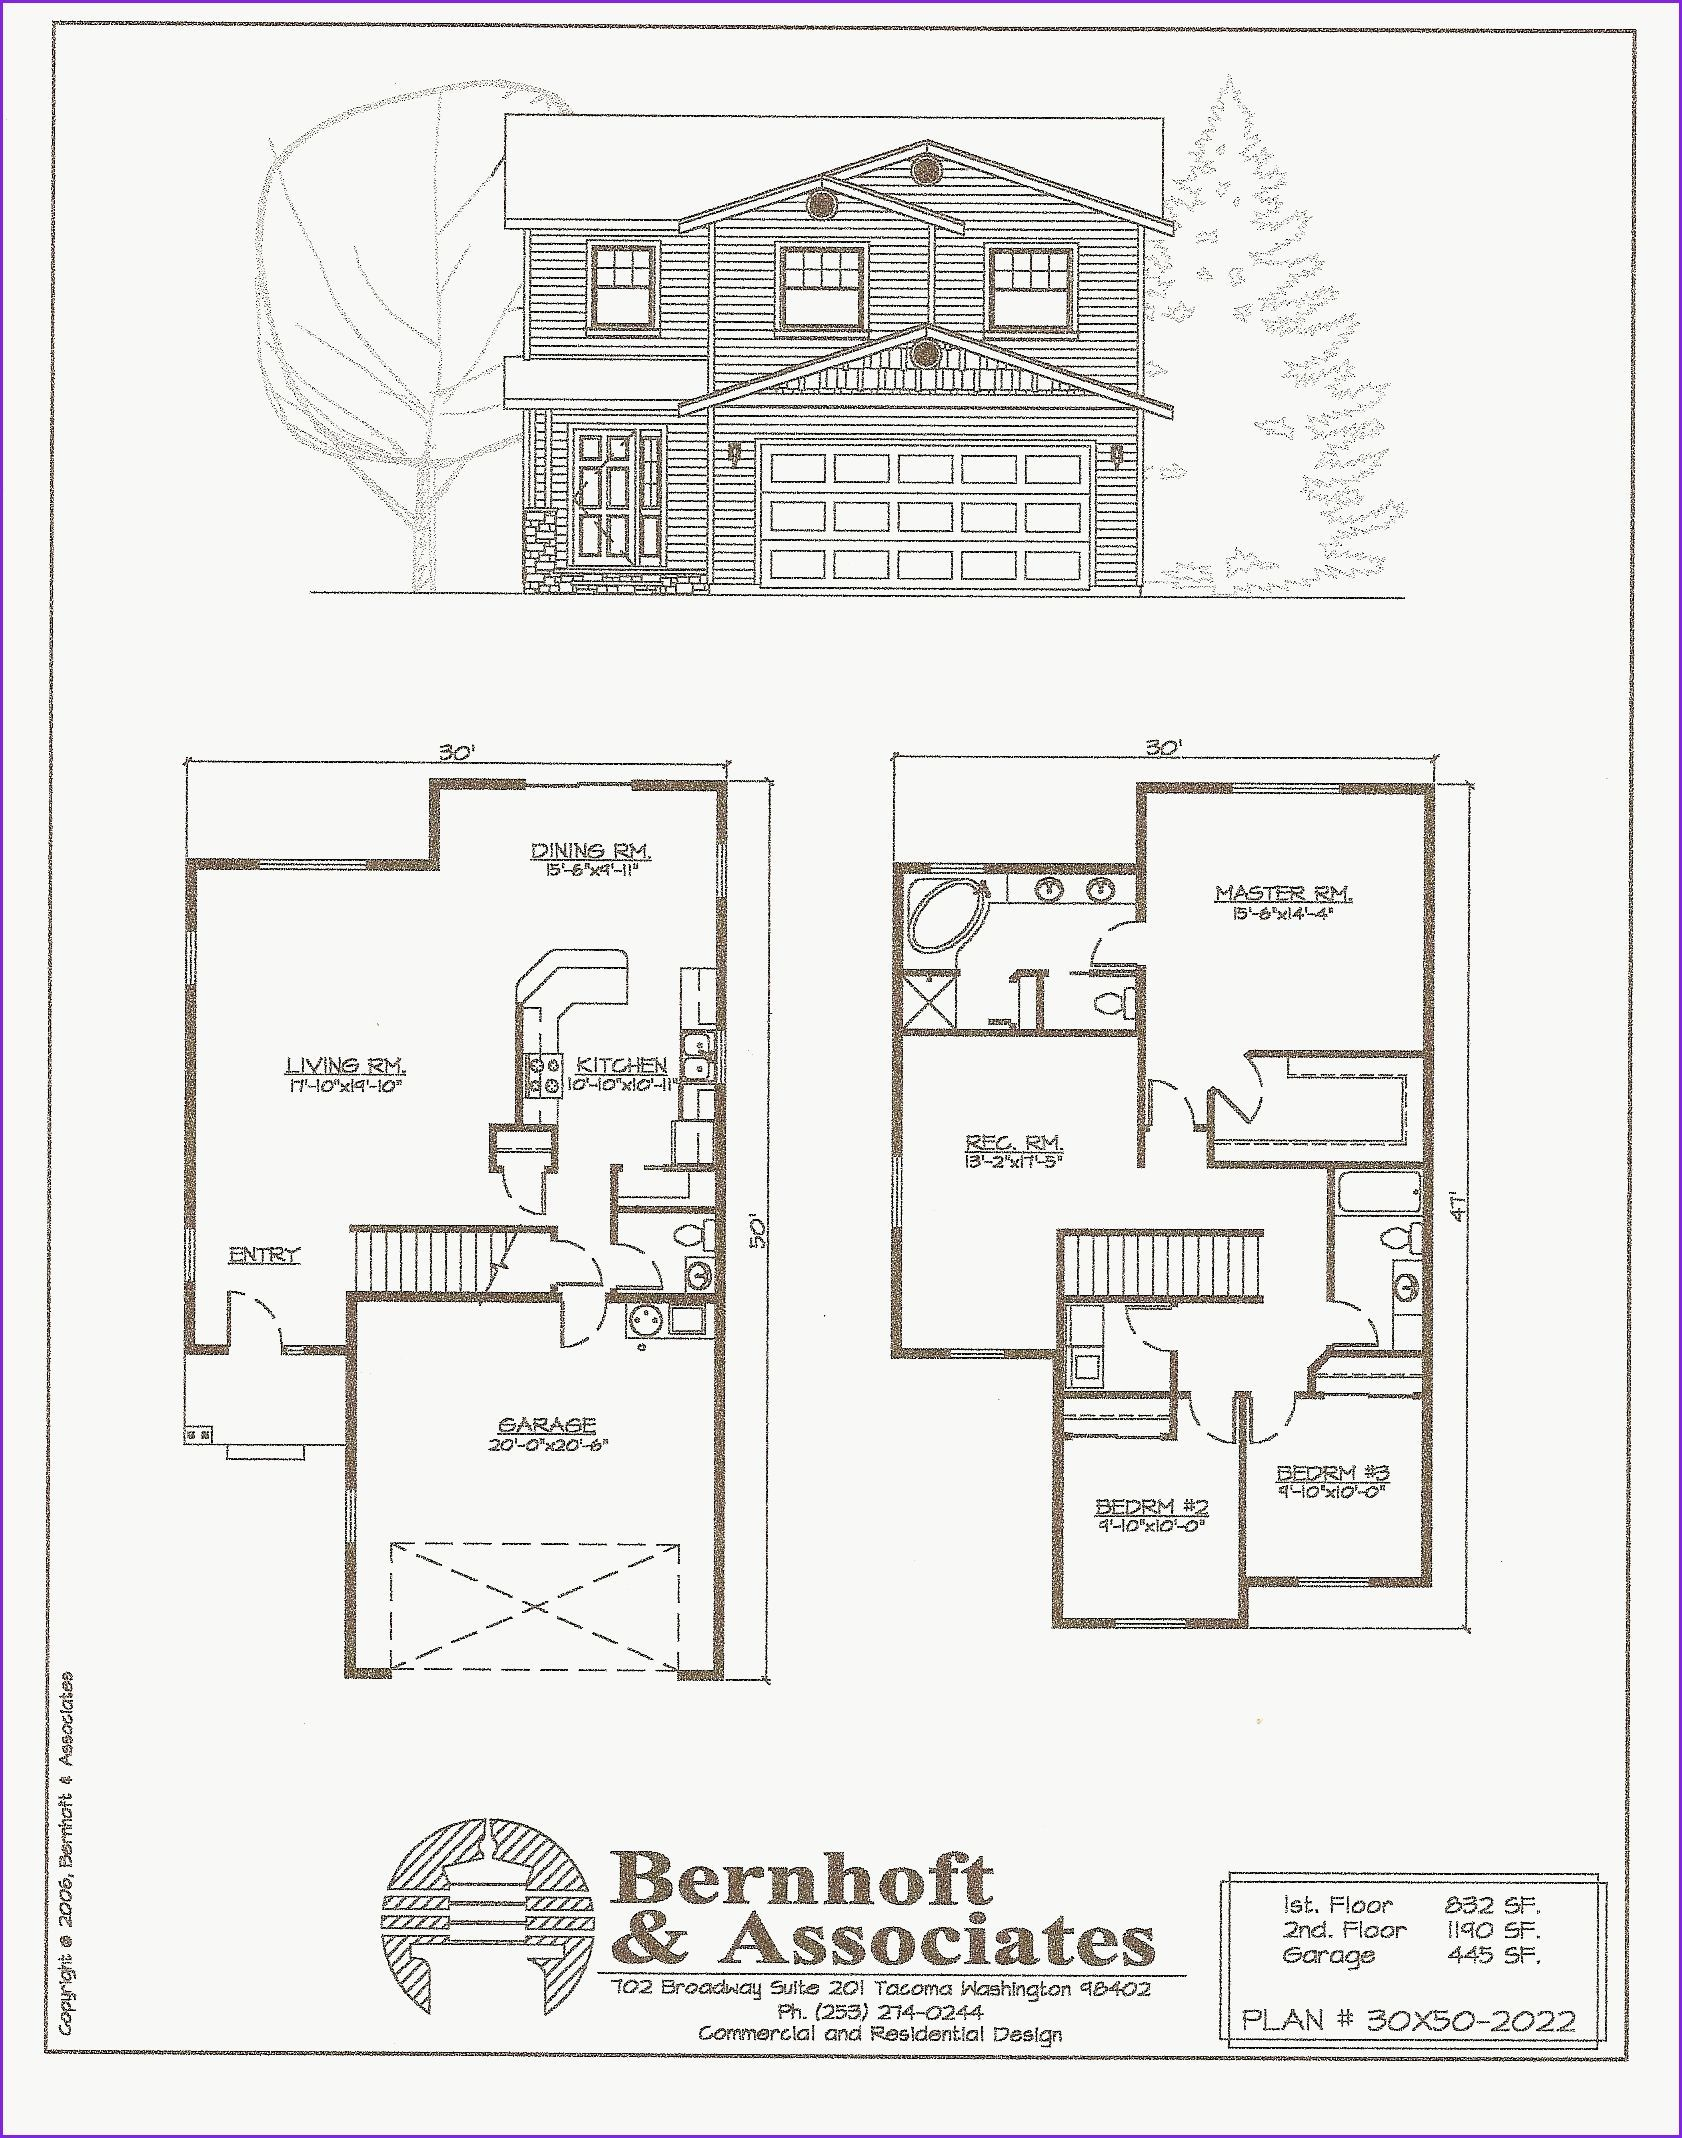 26 X 40 House Plans Fresh 26 X 40 House Plans 24 30 Floor In 2020 Free House Plans Floor Plan Design Floor Plans